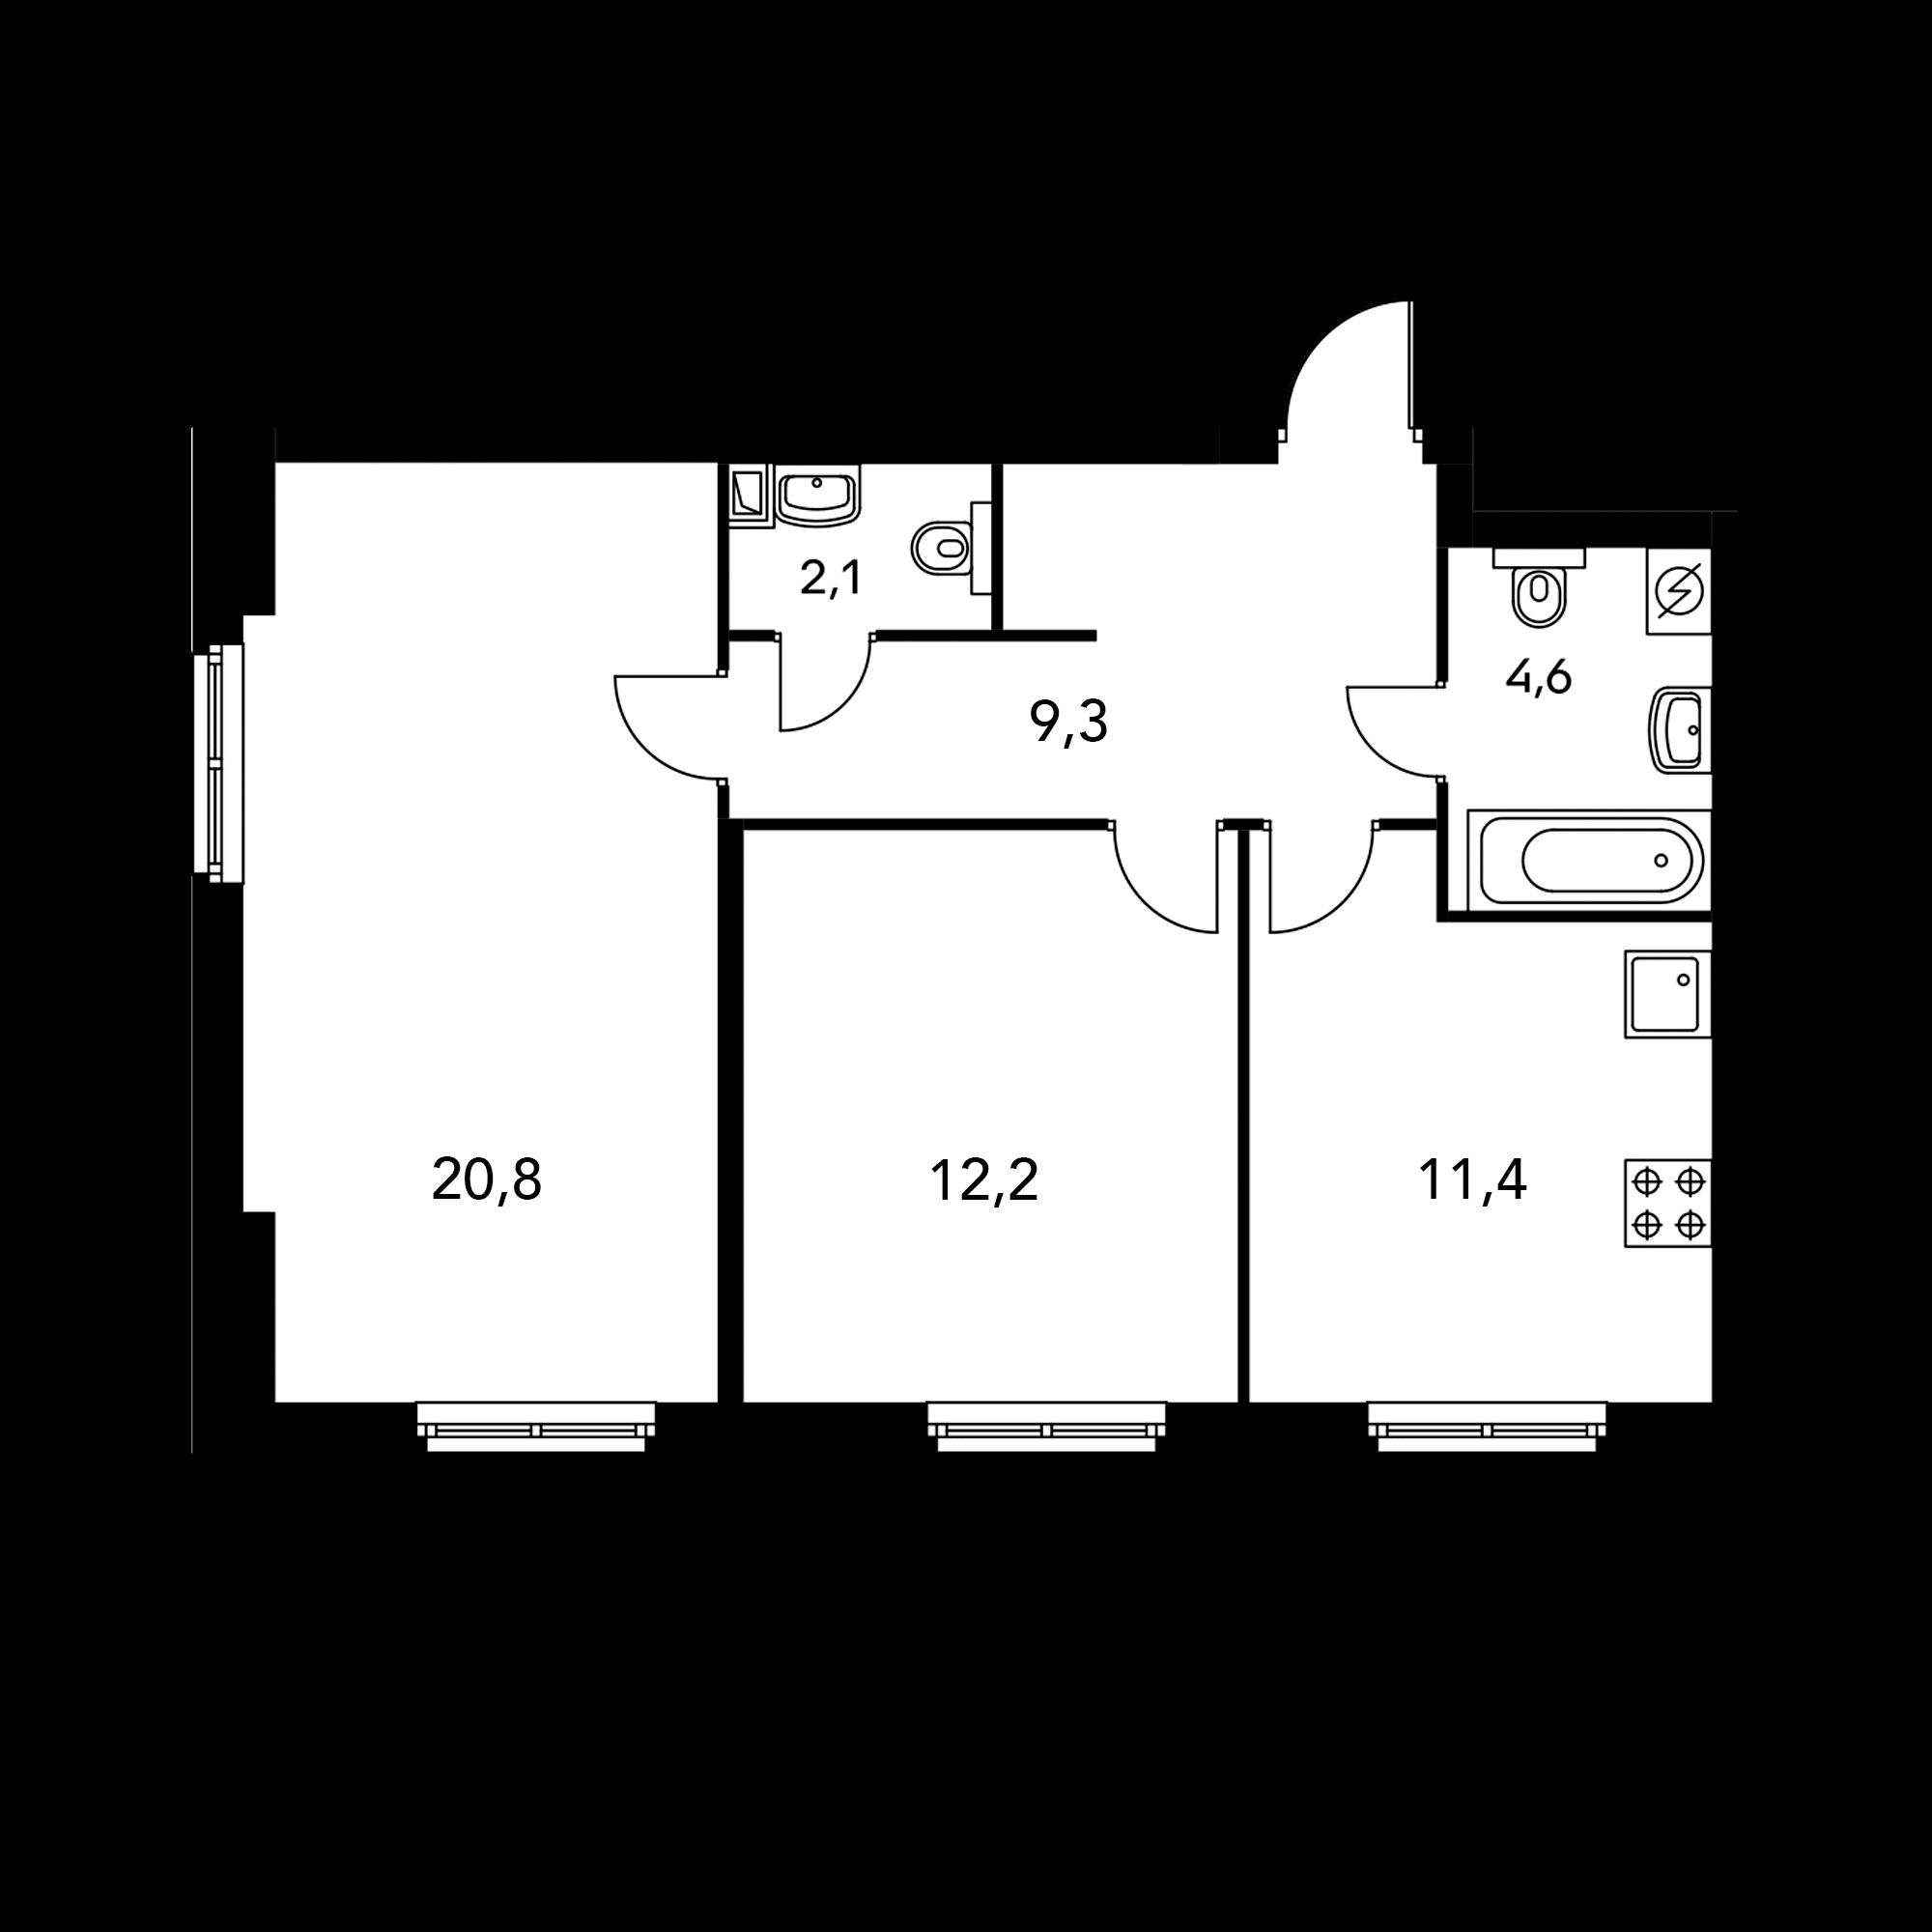 2KM6_9.9